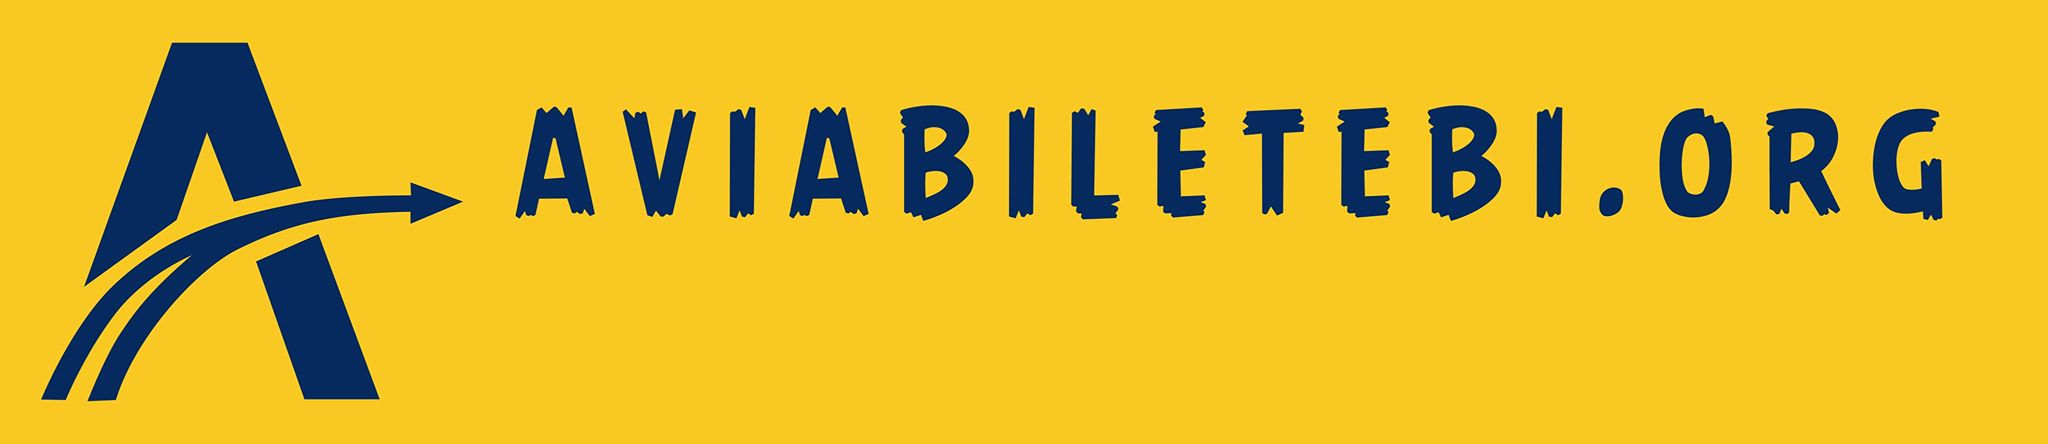 Aviabiletebi.org